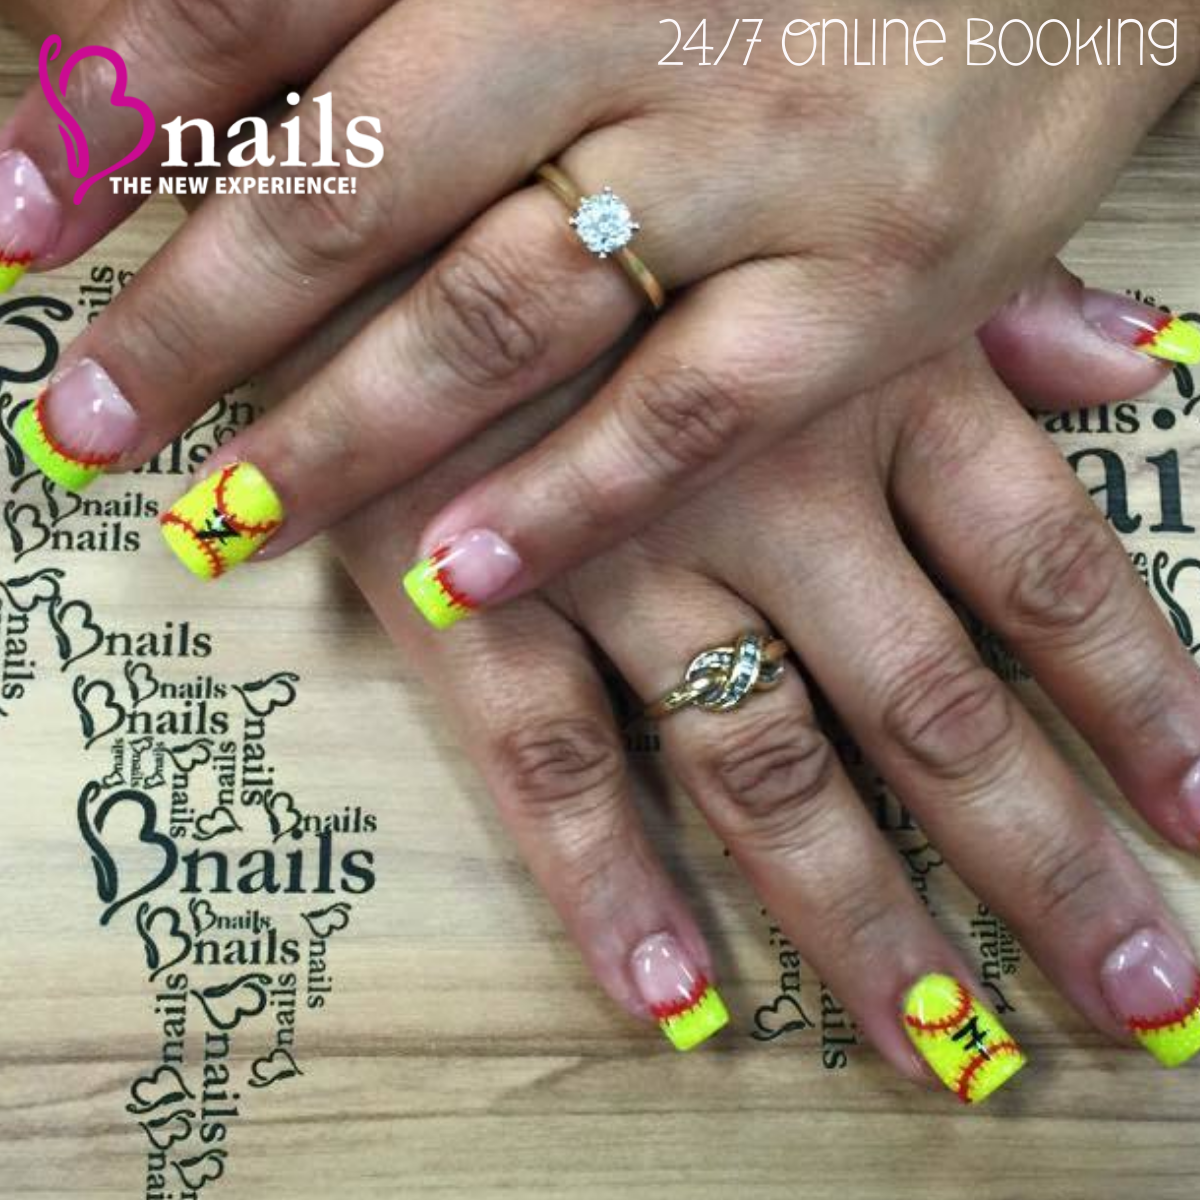 Enjoy The Best Nails Salon Service Better Than You Think Bnails Best Nail Salon Beach Nails Nails